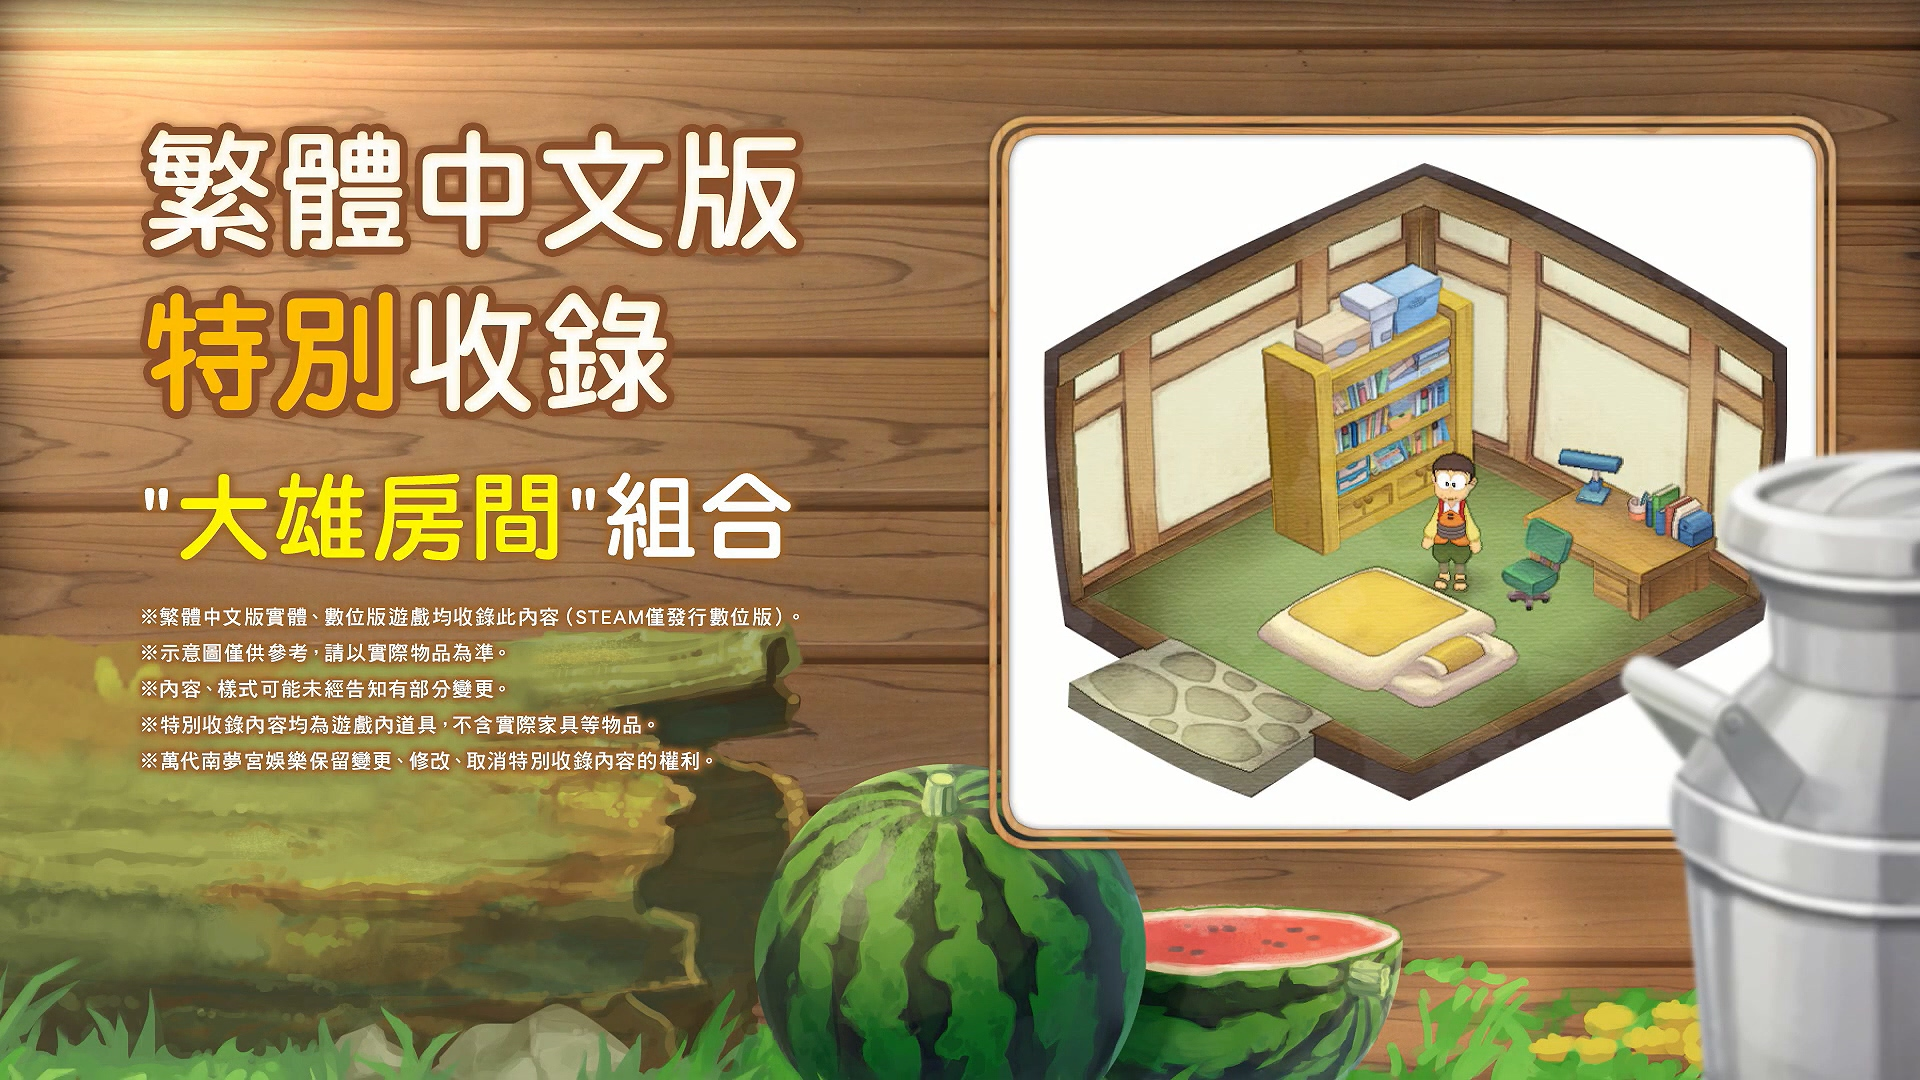 PC版《哆啦A梦:大雄的牧场物语》确定秋季登陆STEAM